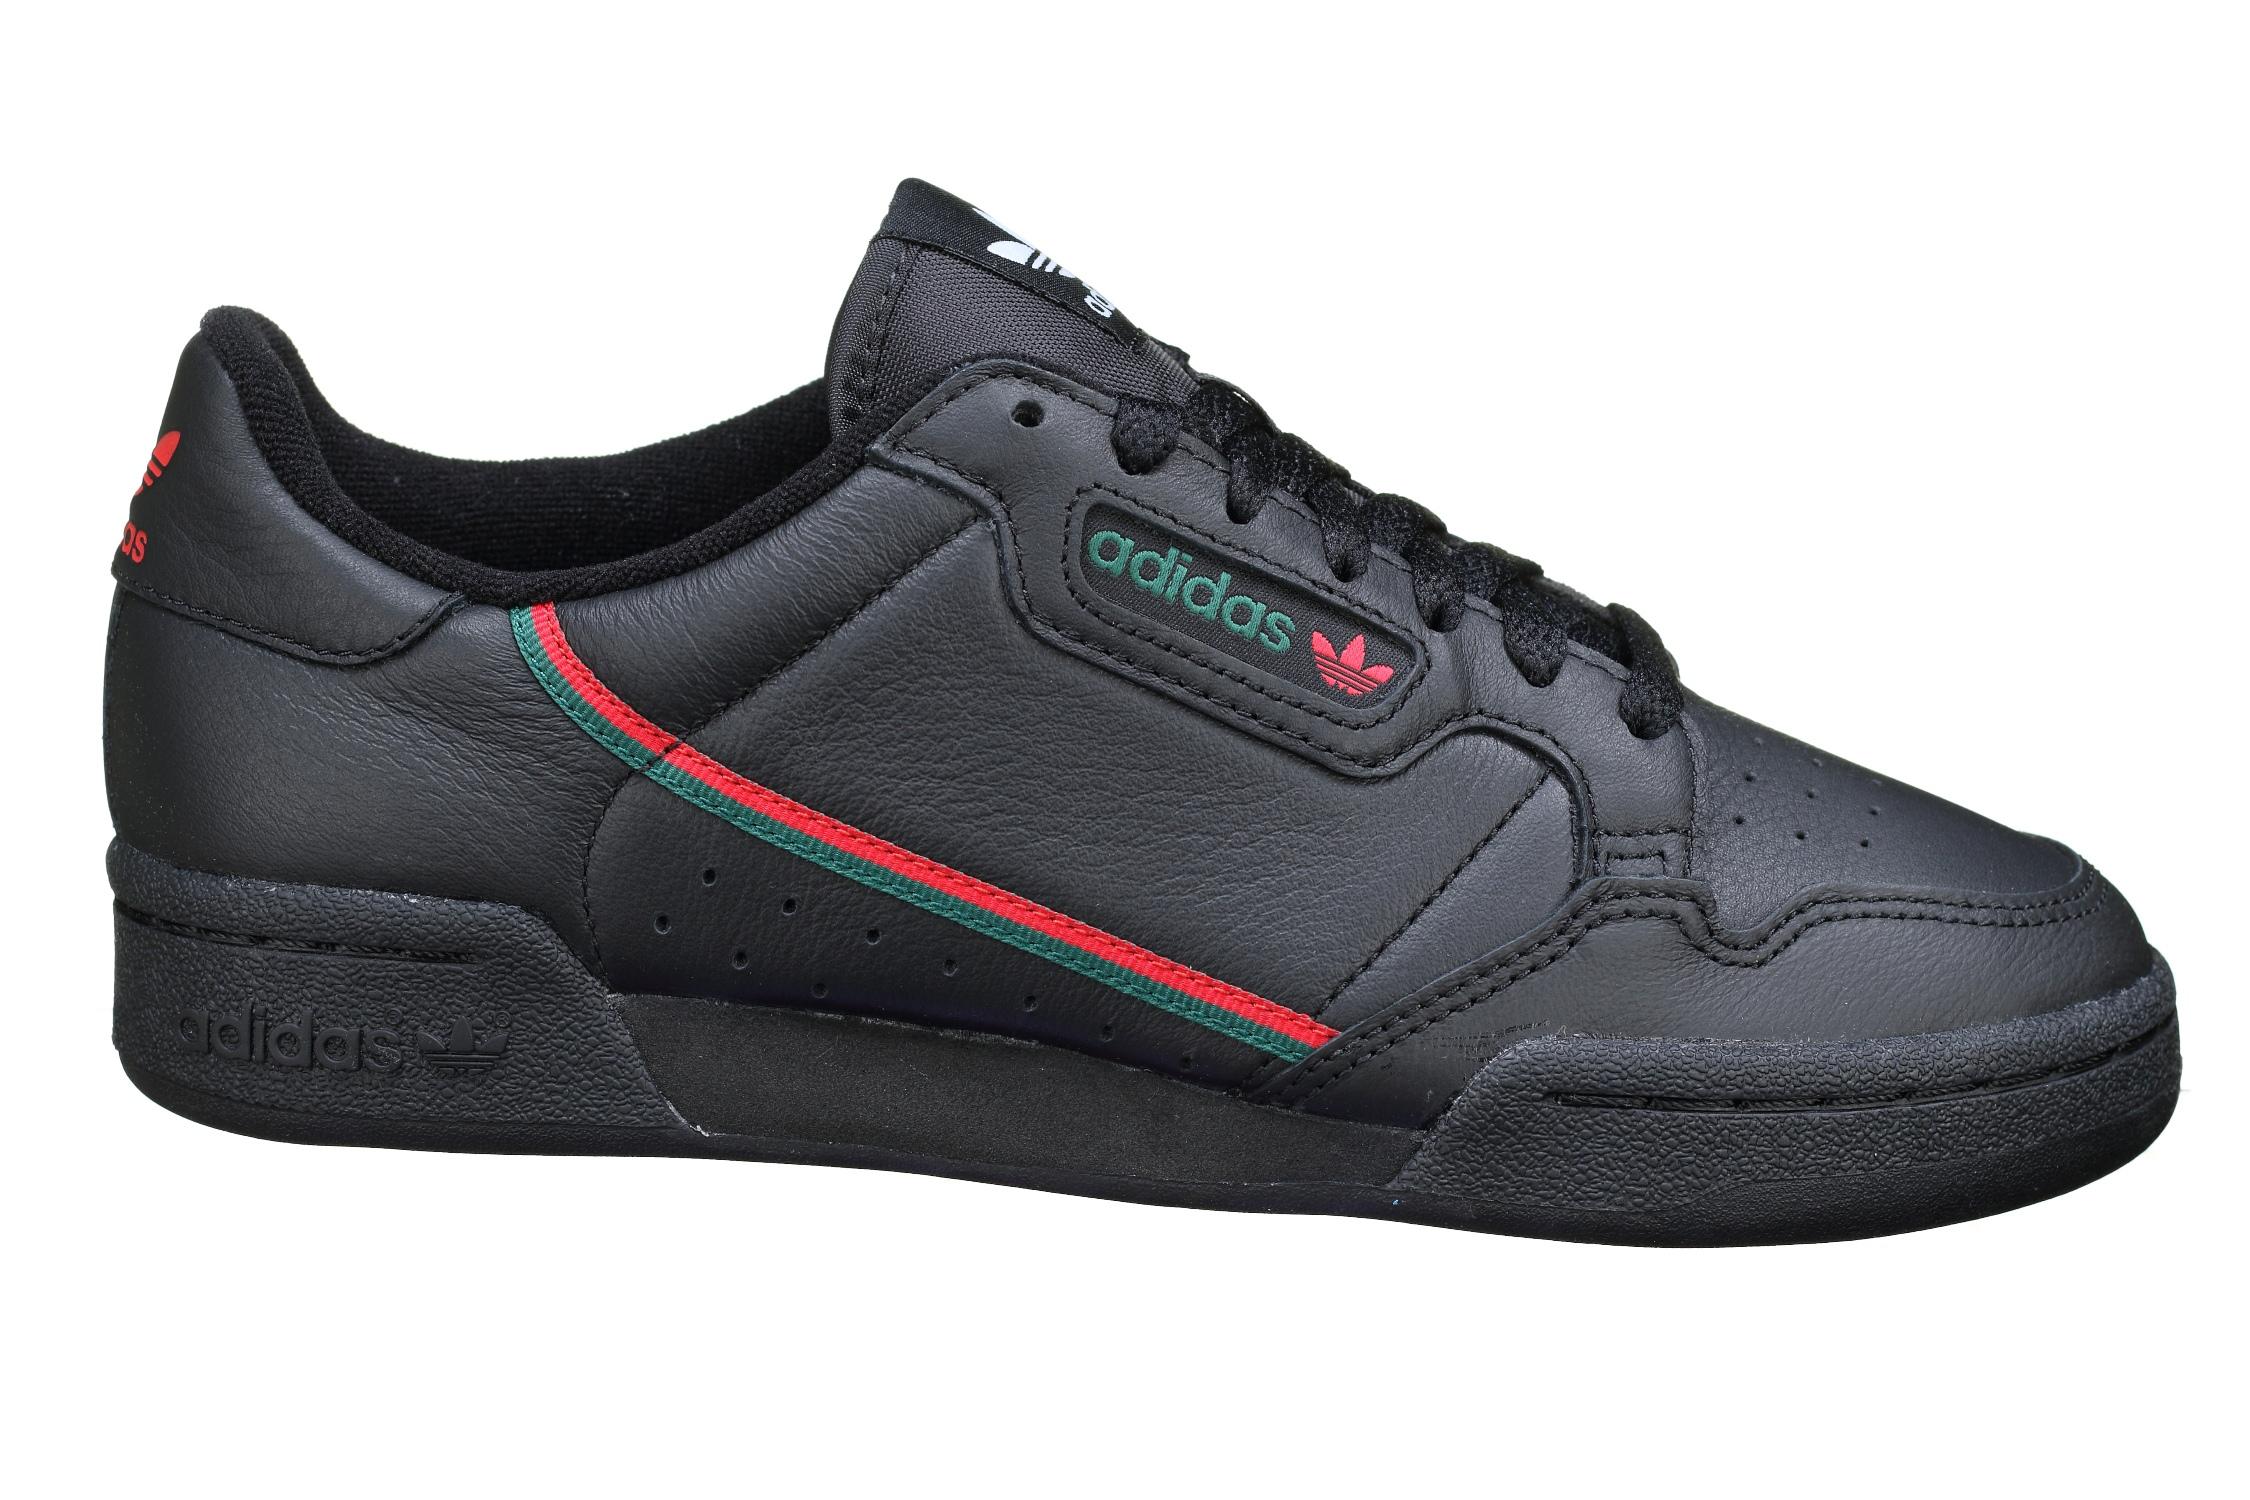 http://www.leadermode.com/174954/adidas-continental-80-ee5343-black.jpg